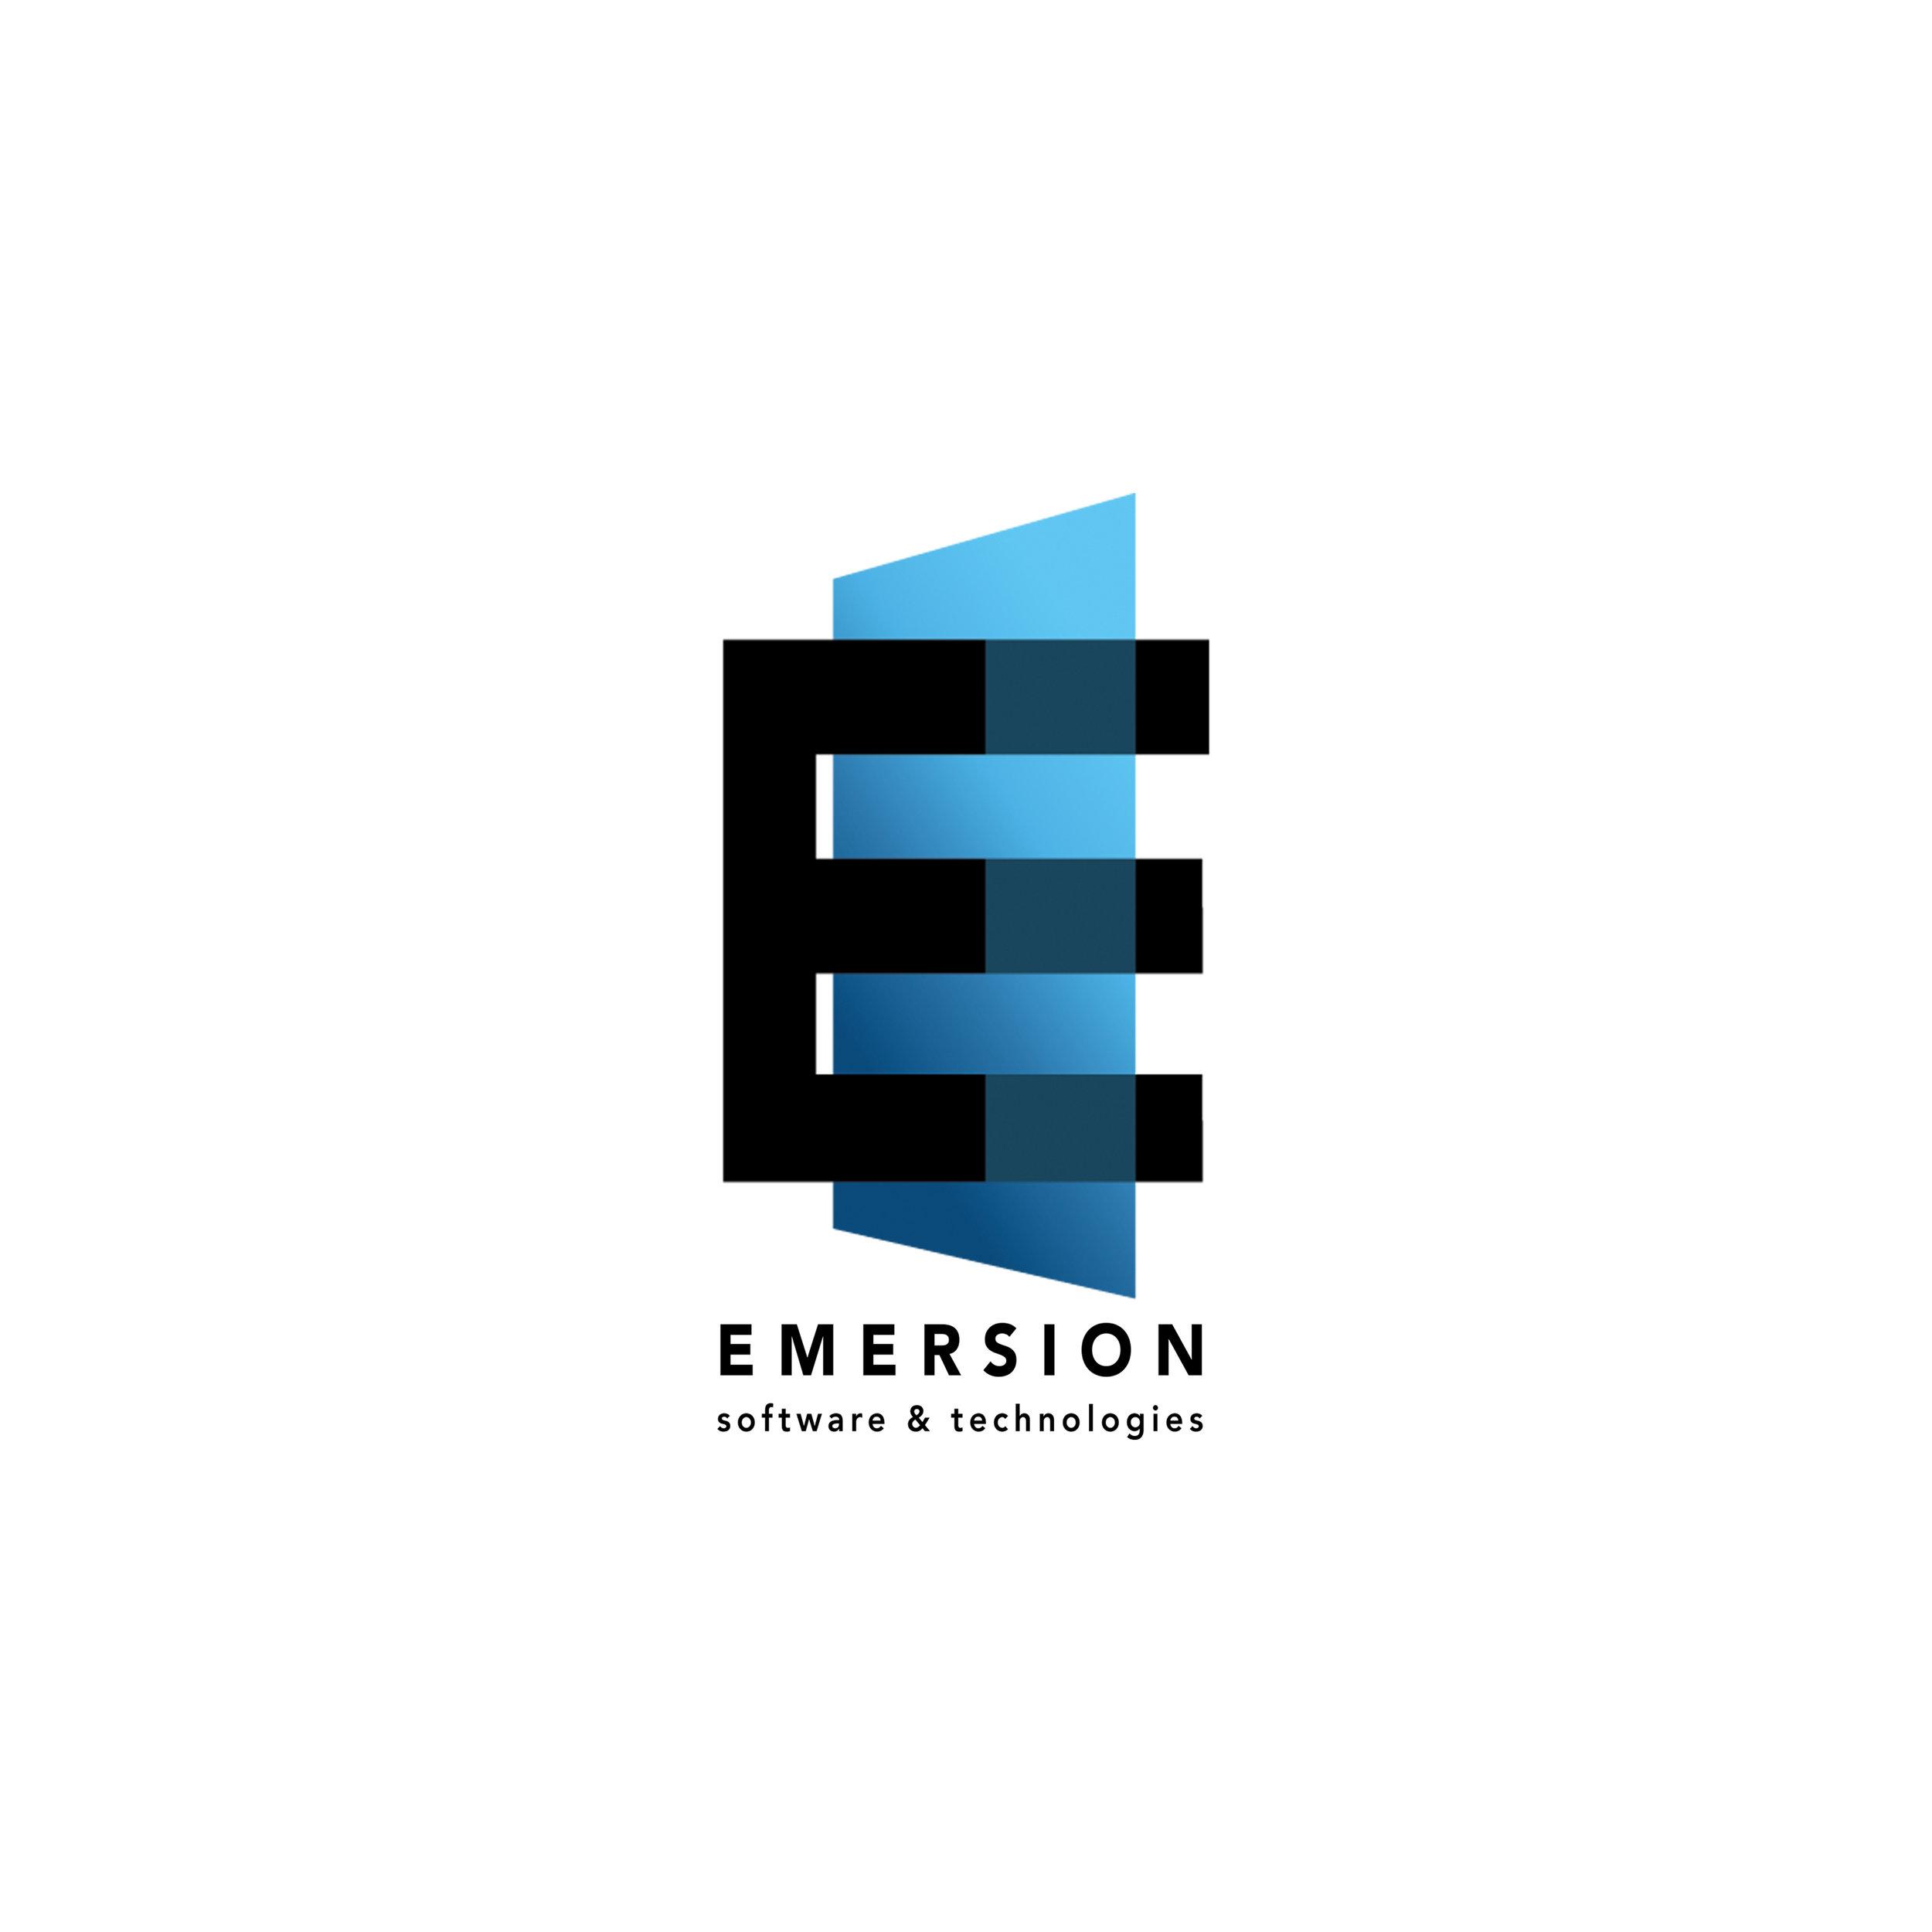 Emersion-4-site.jpg